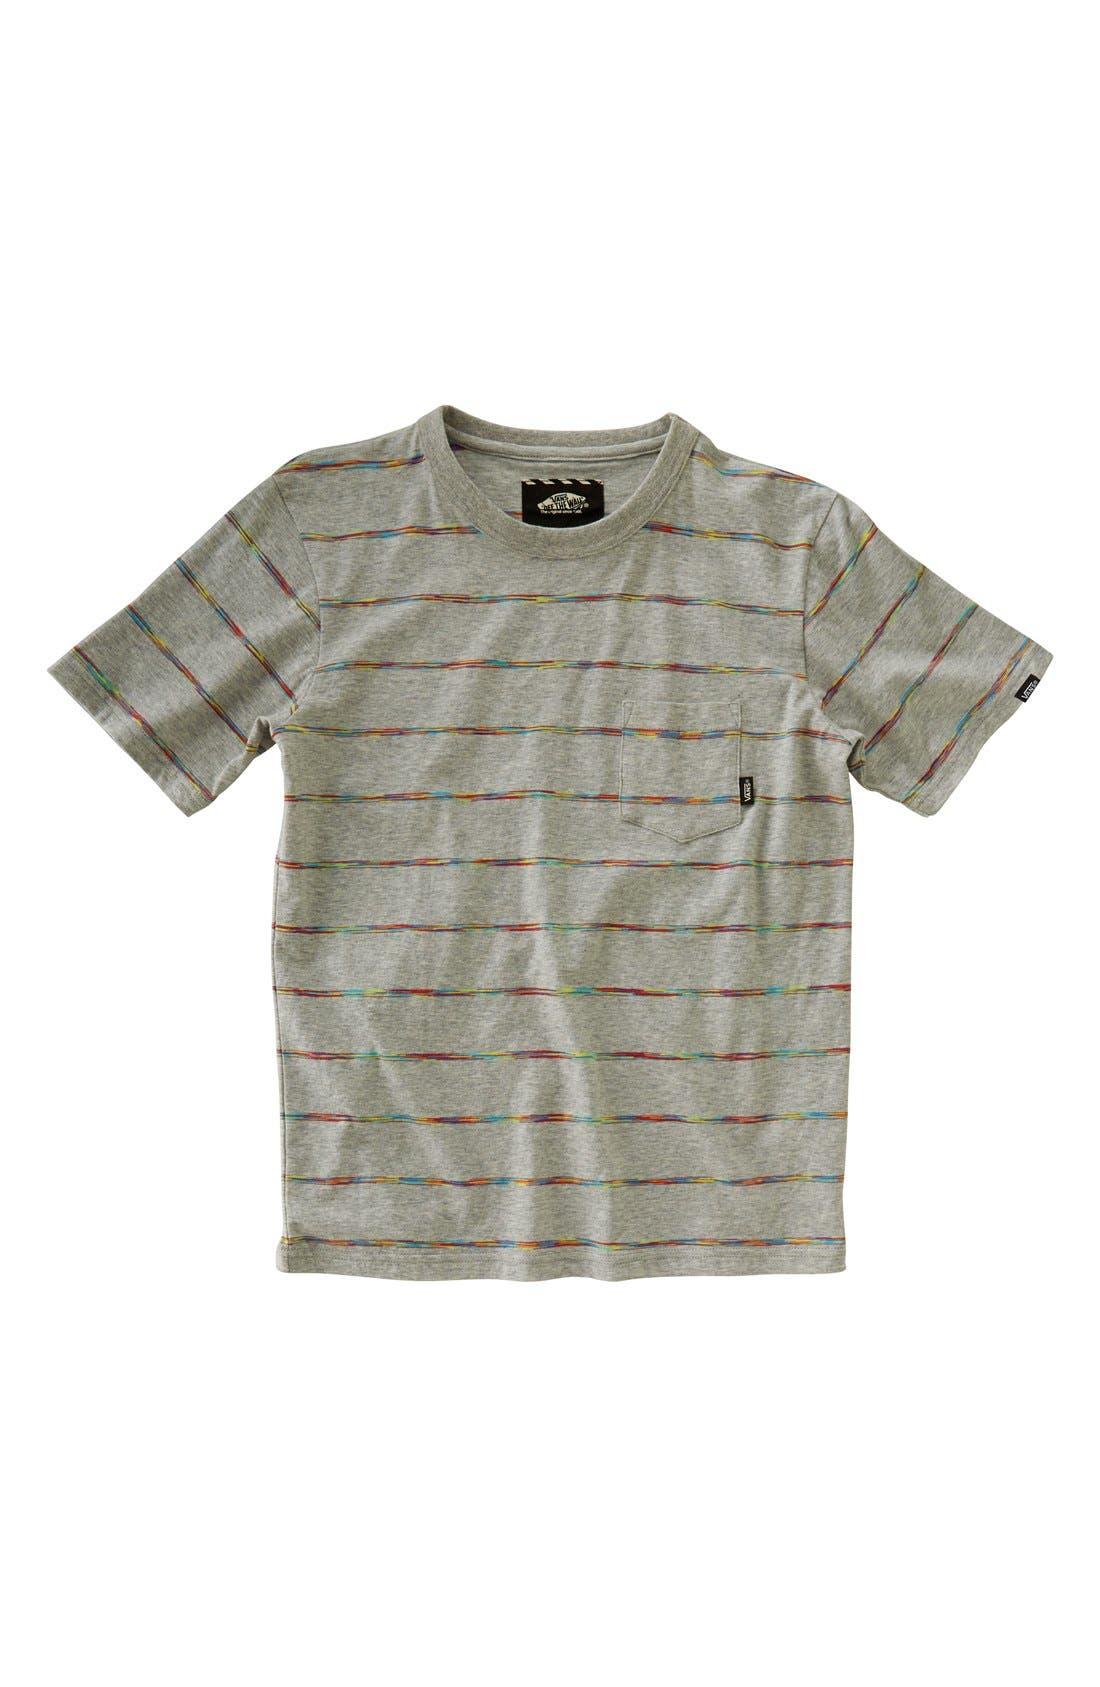 Main Image - Vans 'Lowden' Short Sleeve Pocket T-Shirt (Big Boys)